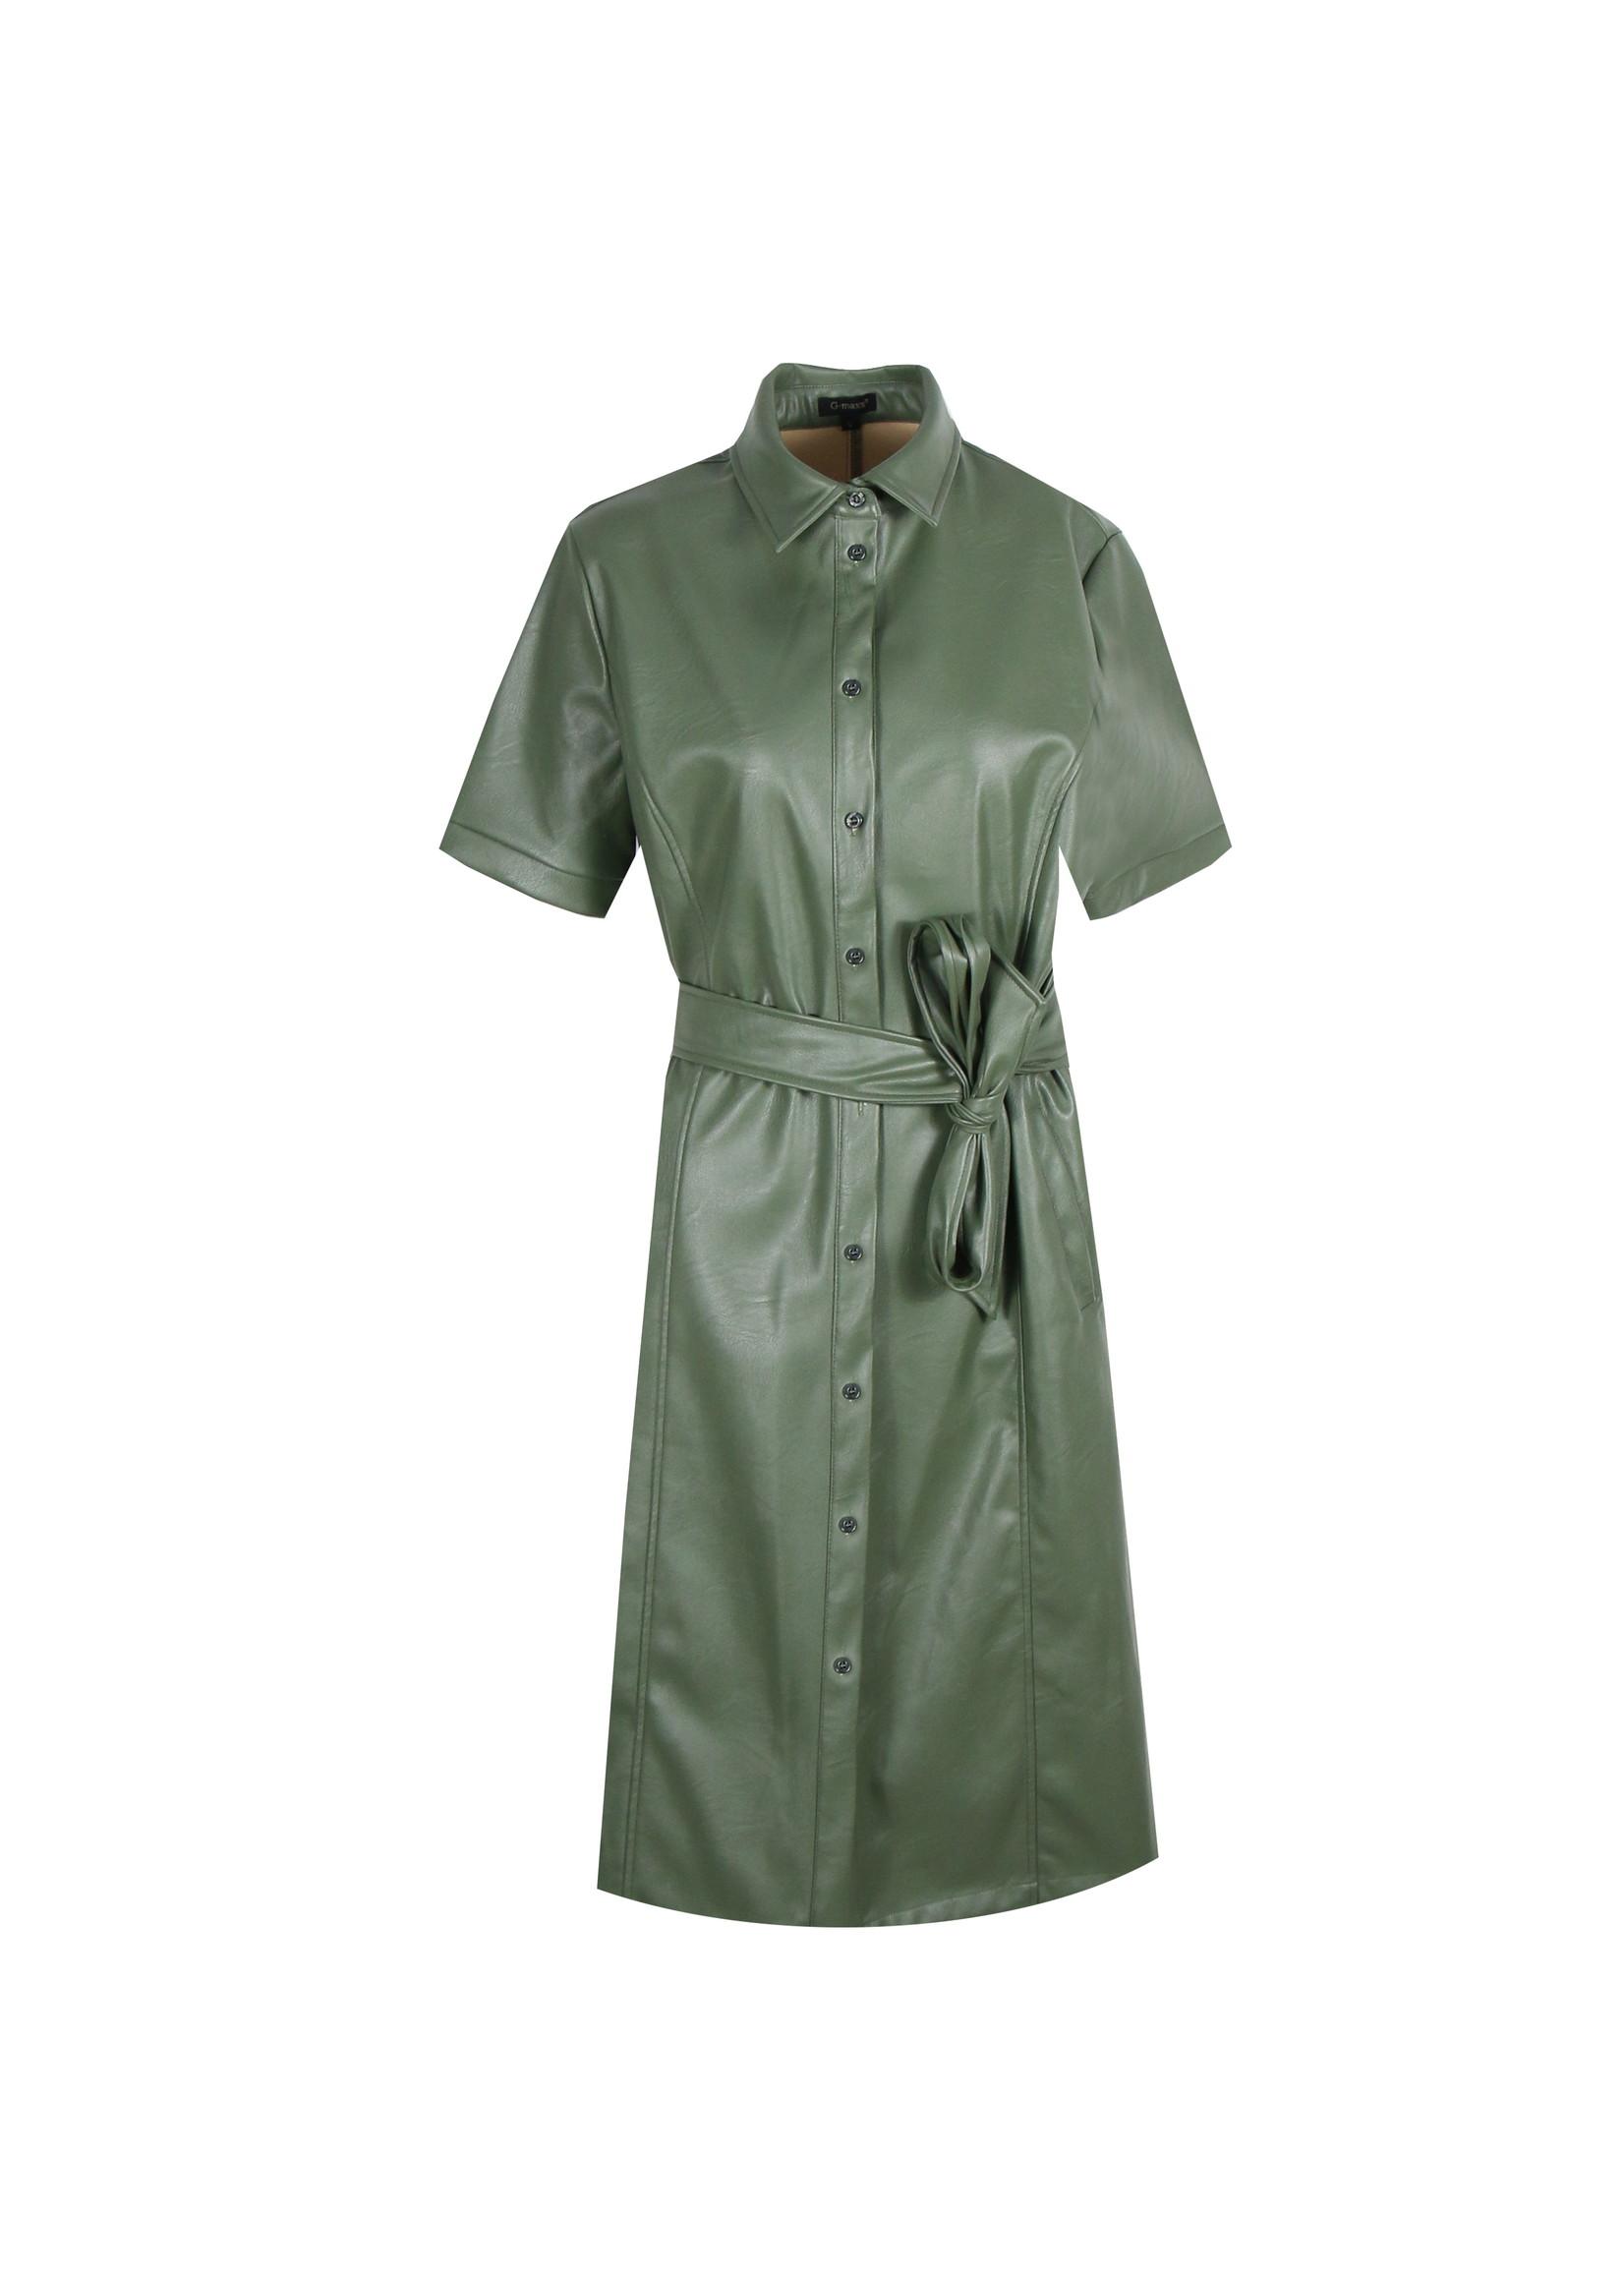 G-Maxx G-Maxx - Giana - jurk groen, vegan leather